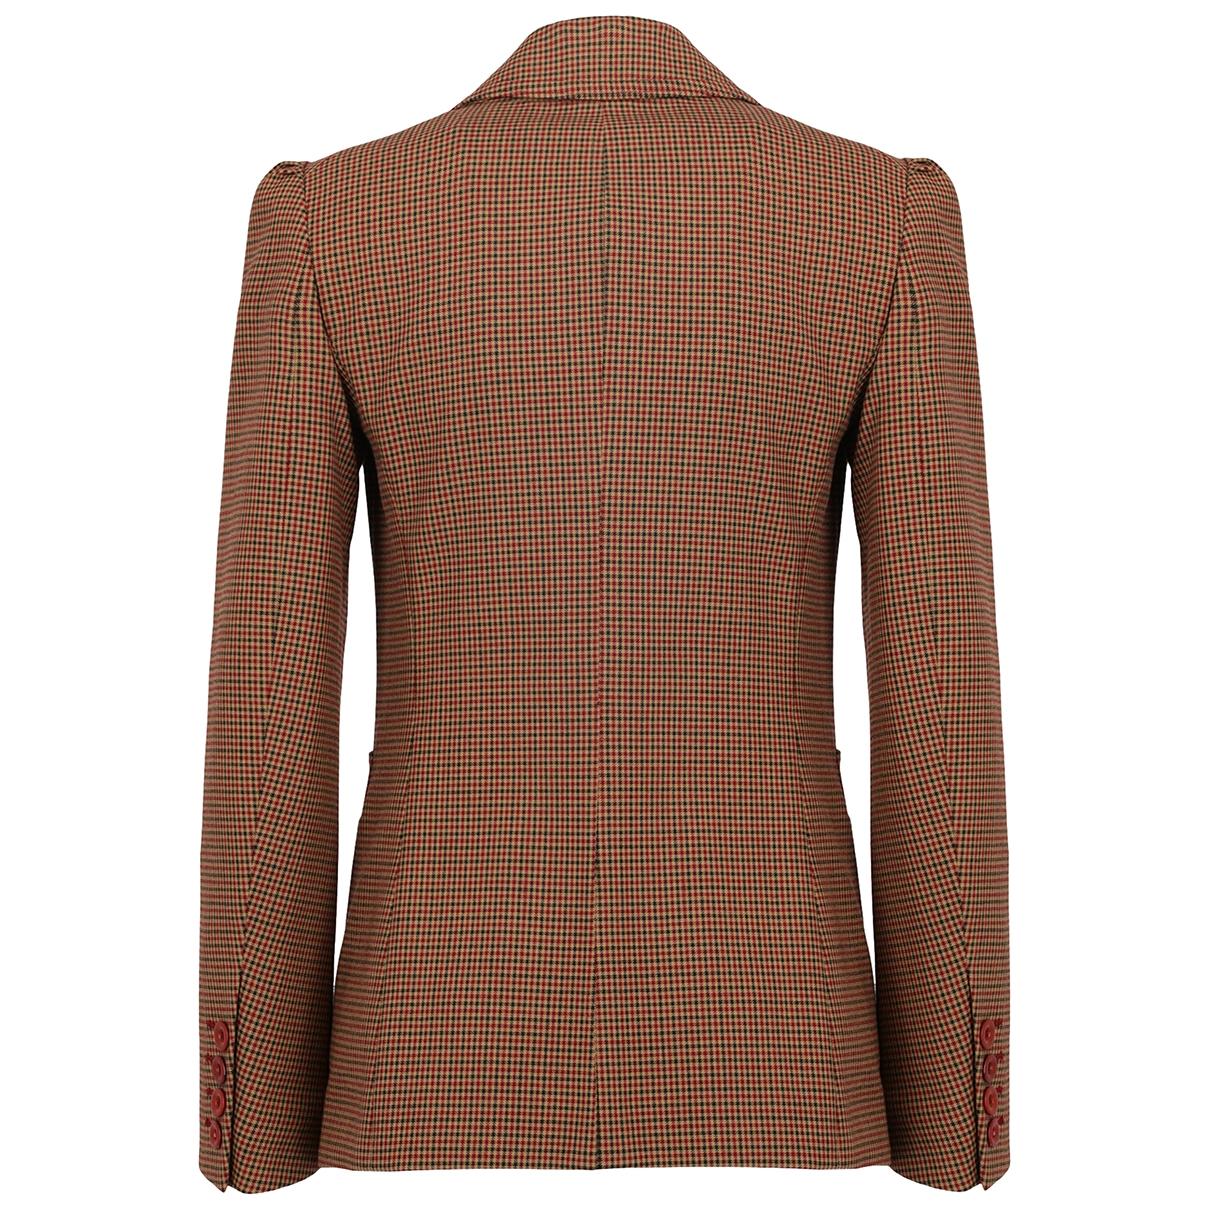 Chloé \N Brown jacket for Women 40 FR